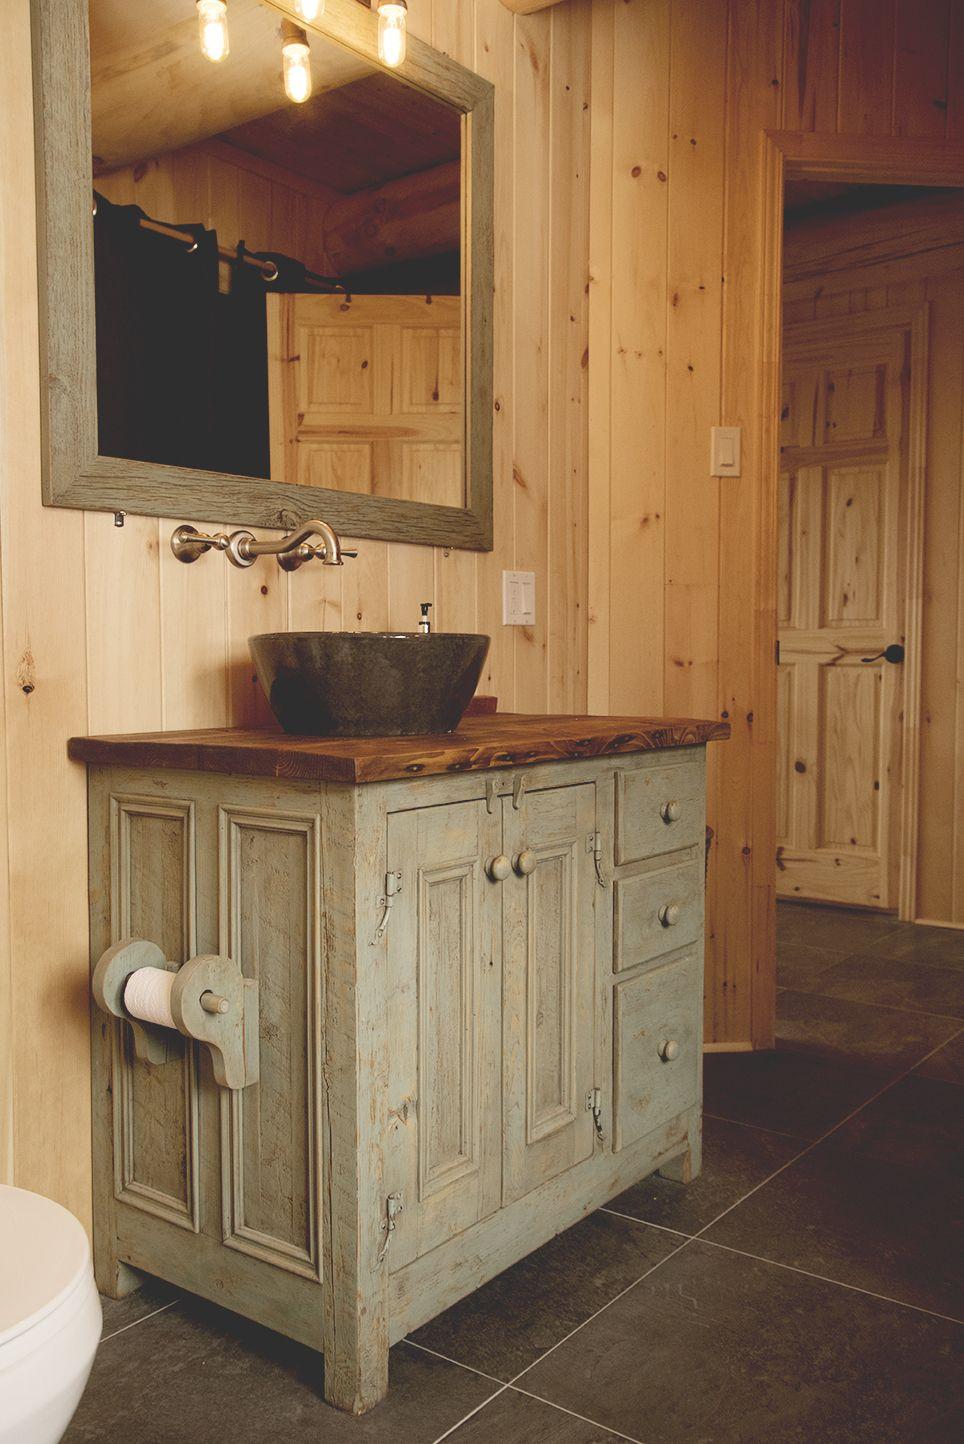 Meubles lavabo en bois de grange julie houde audet photographe - Meuble lavabo bois ...